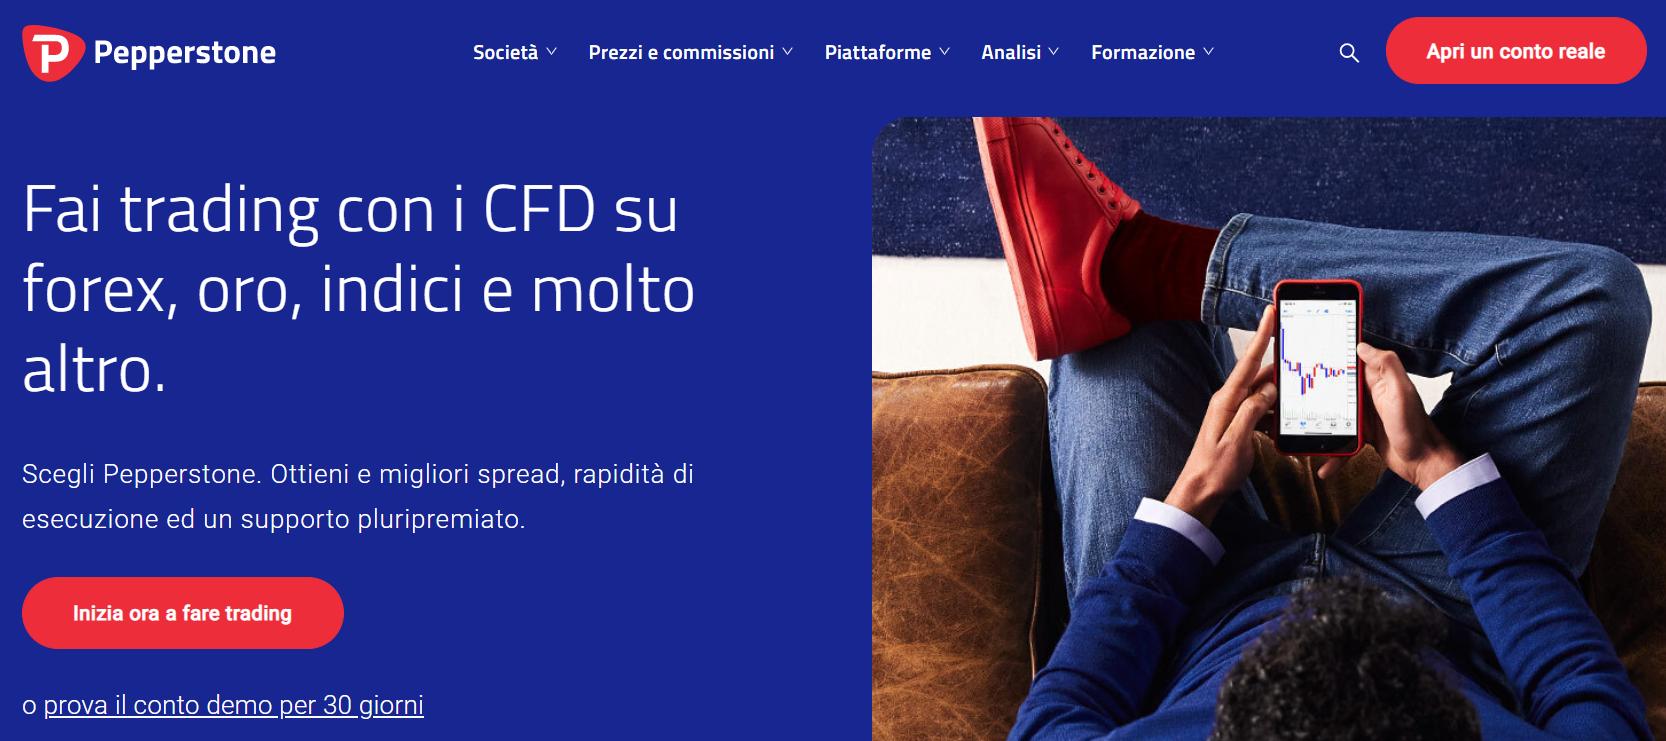 broker finanziario online